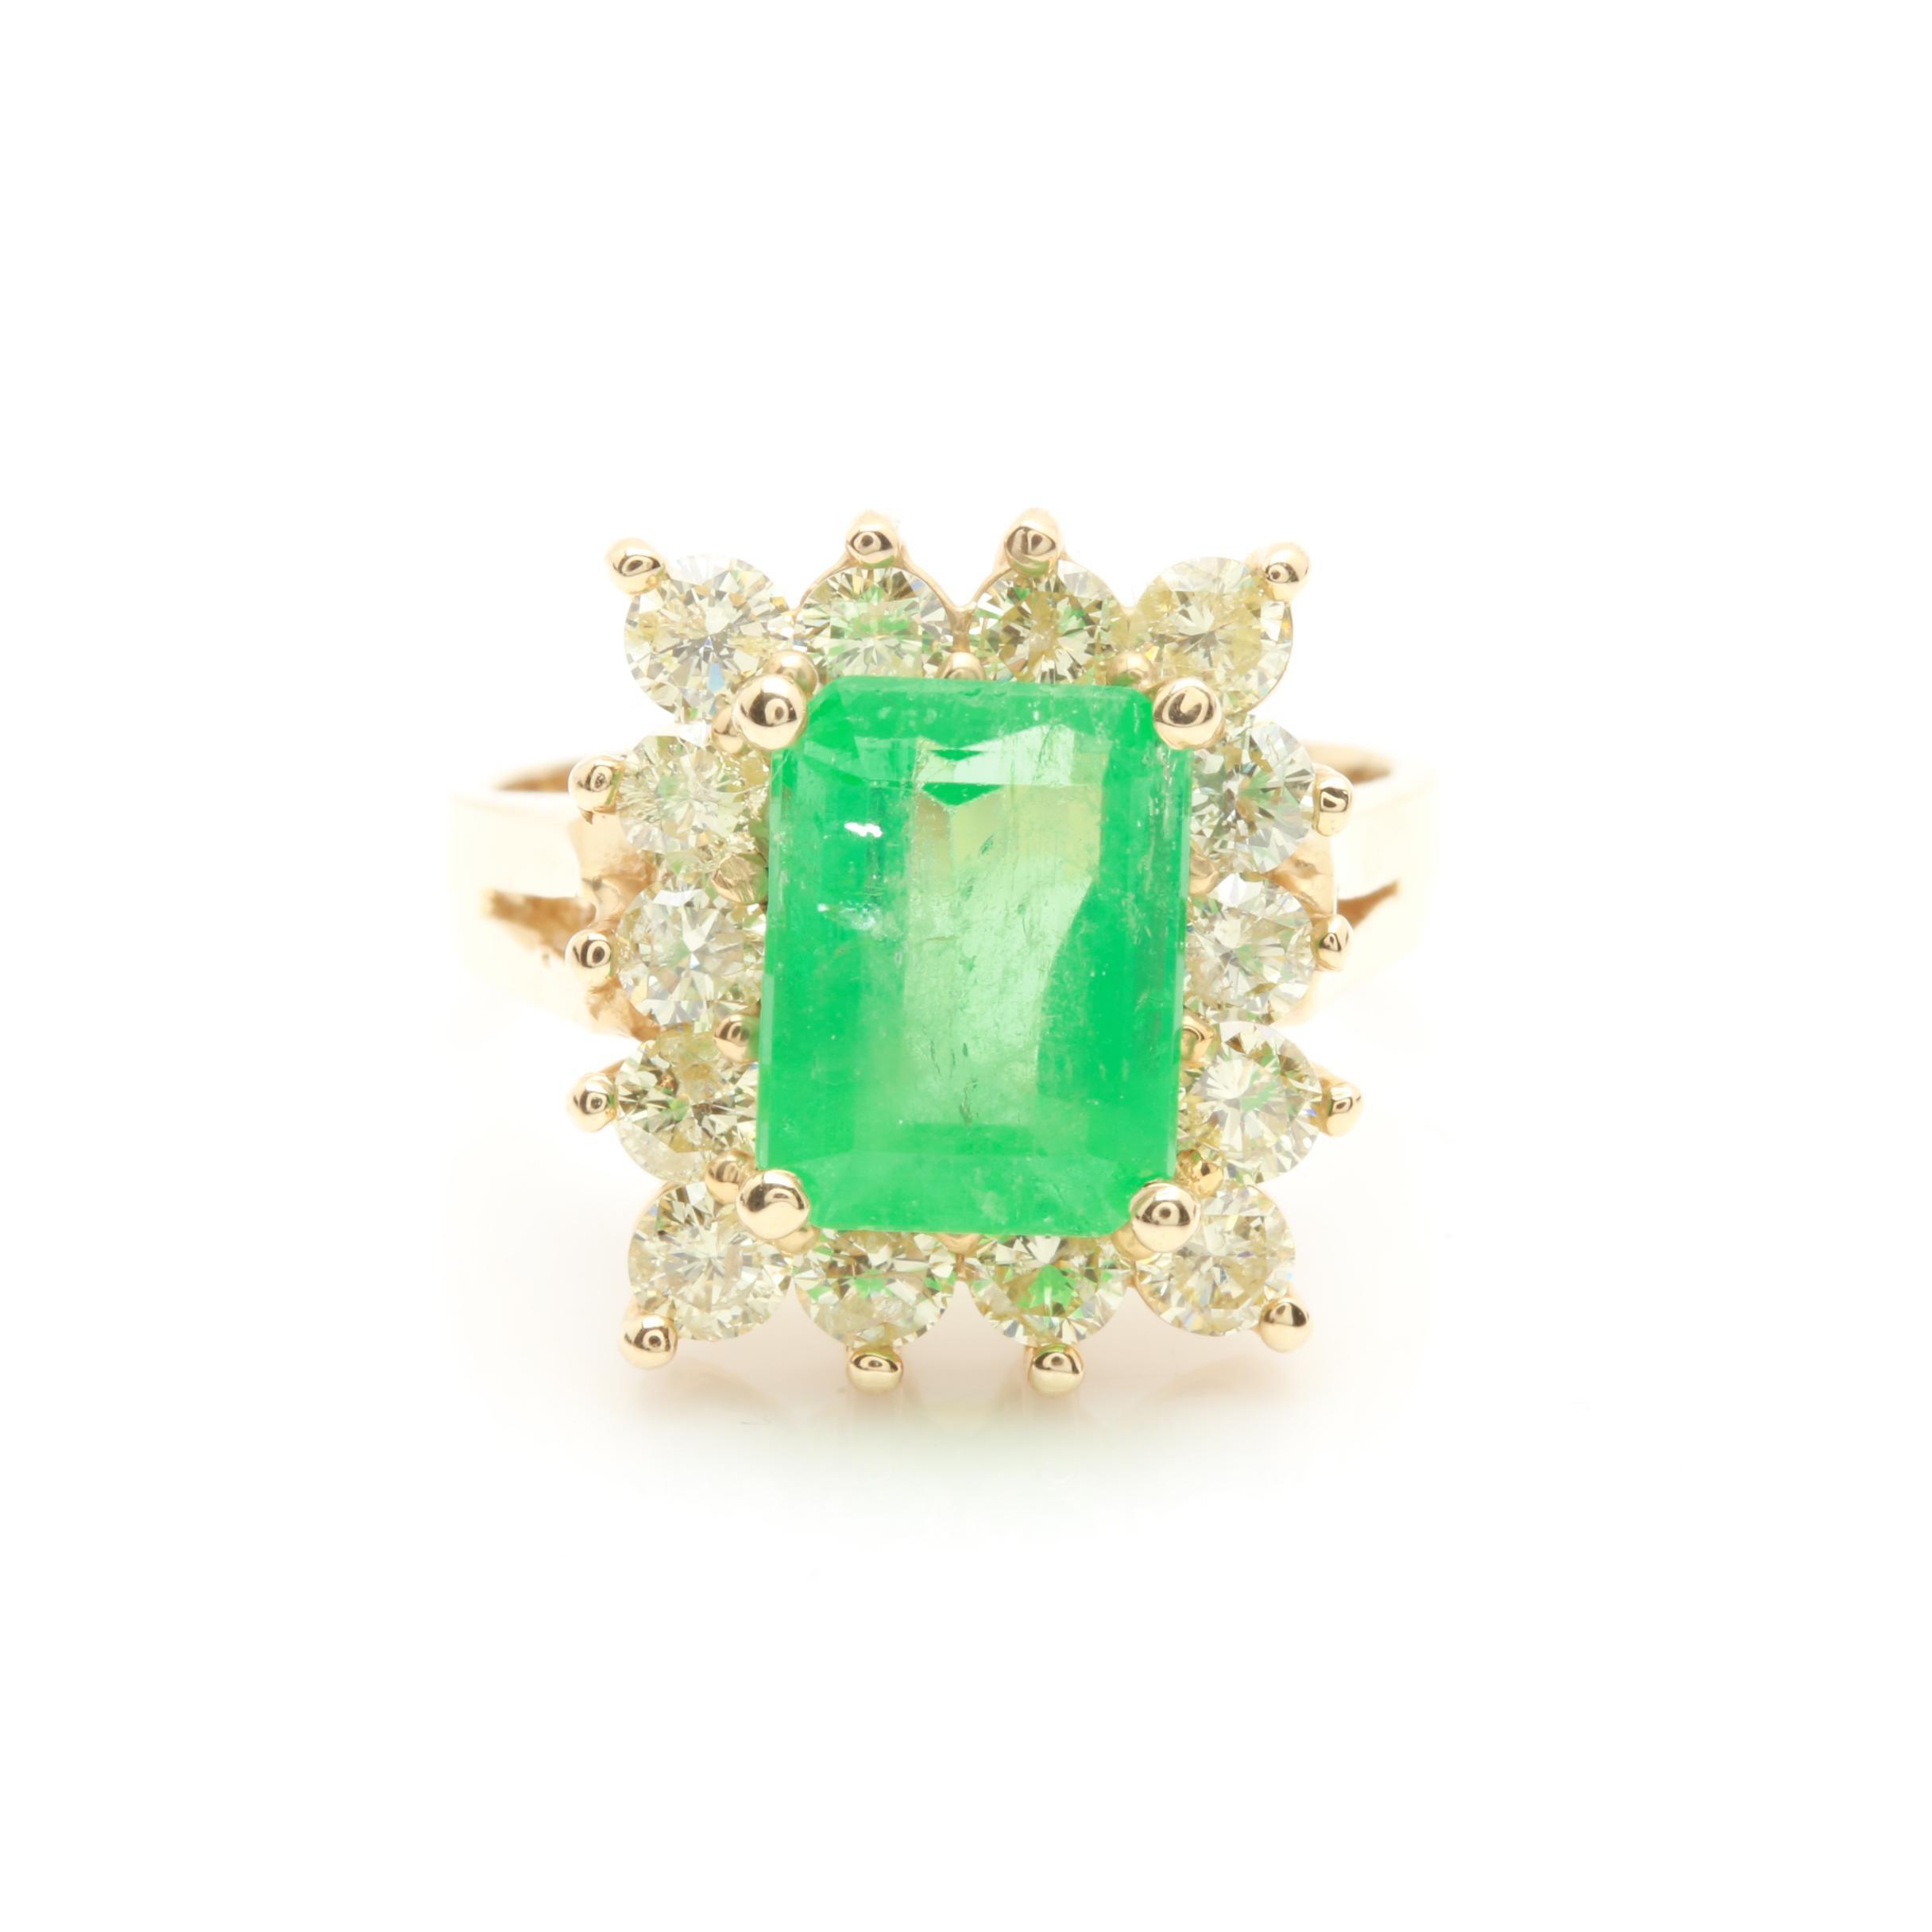 14K Yellow Gold 2.48 CT Emerald and 1.33 CTW Diamond Ring